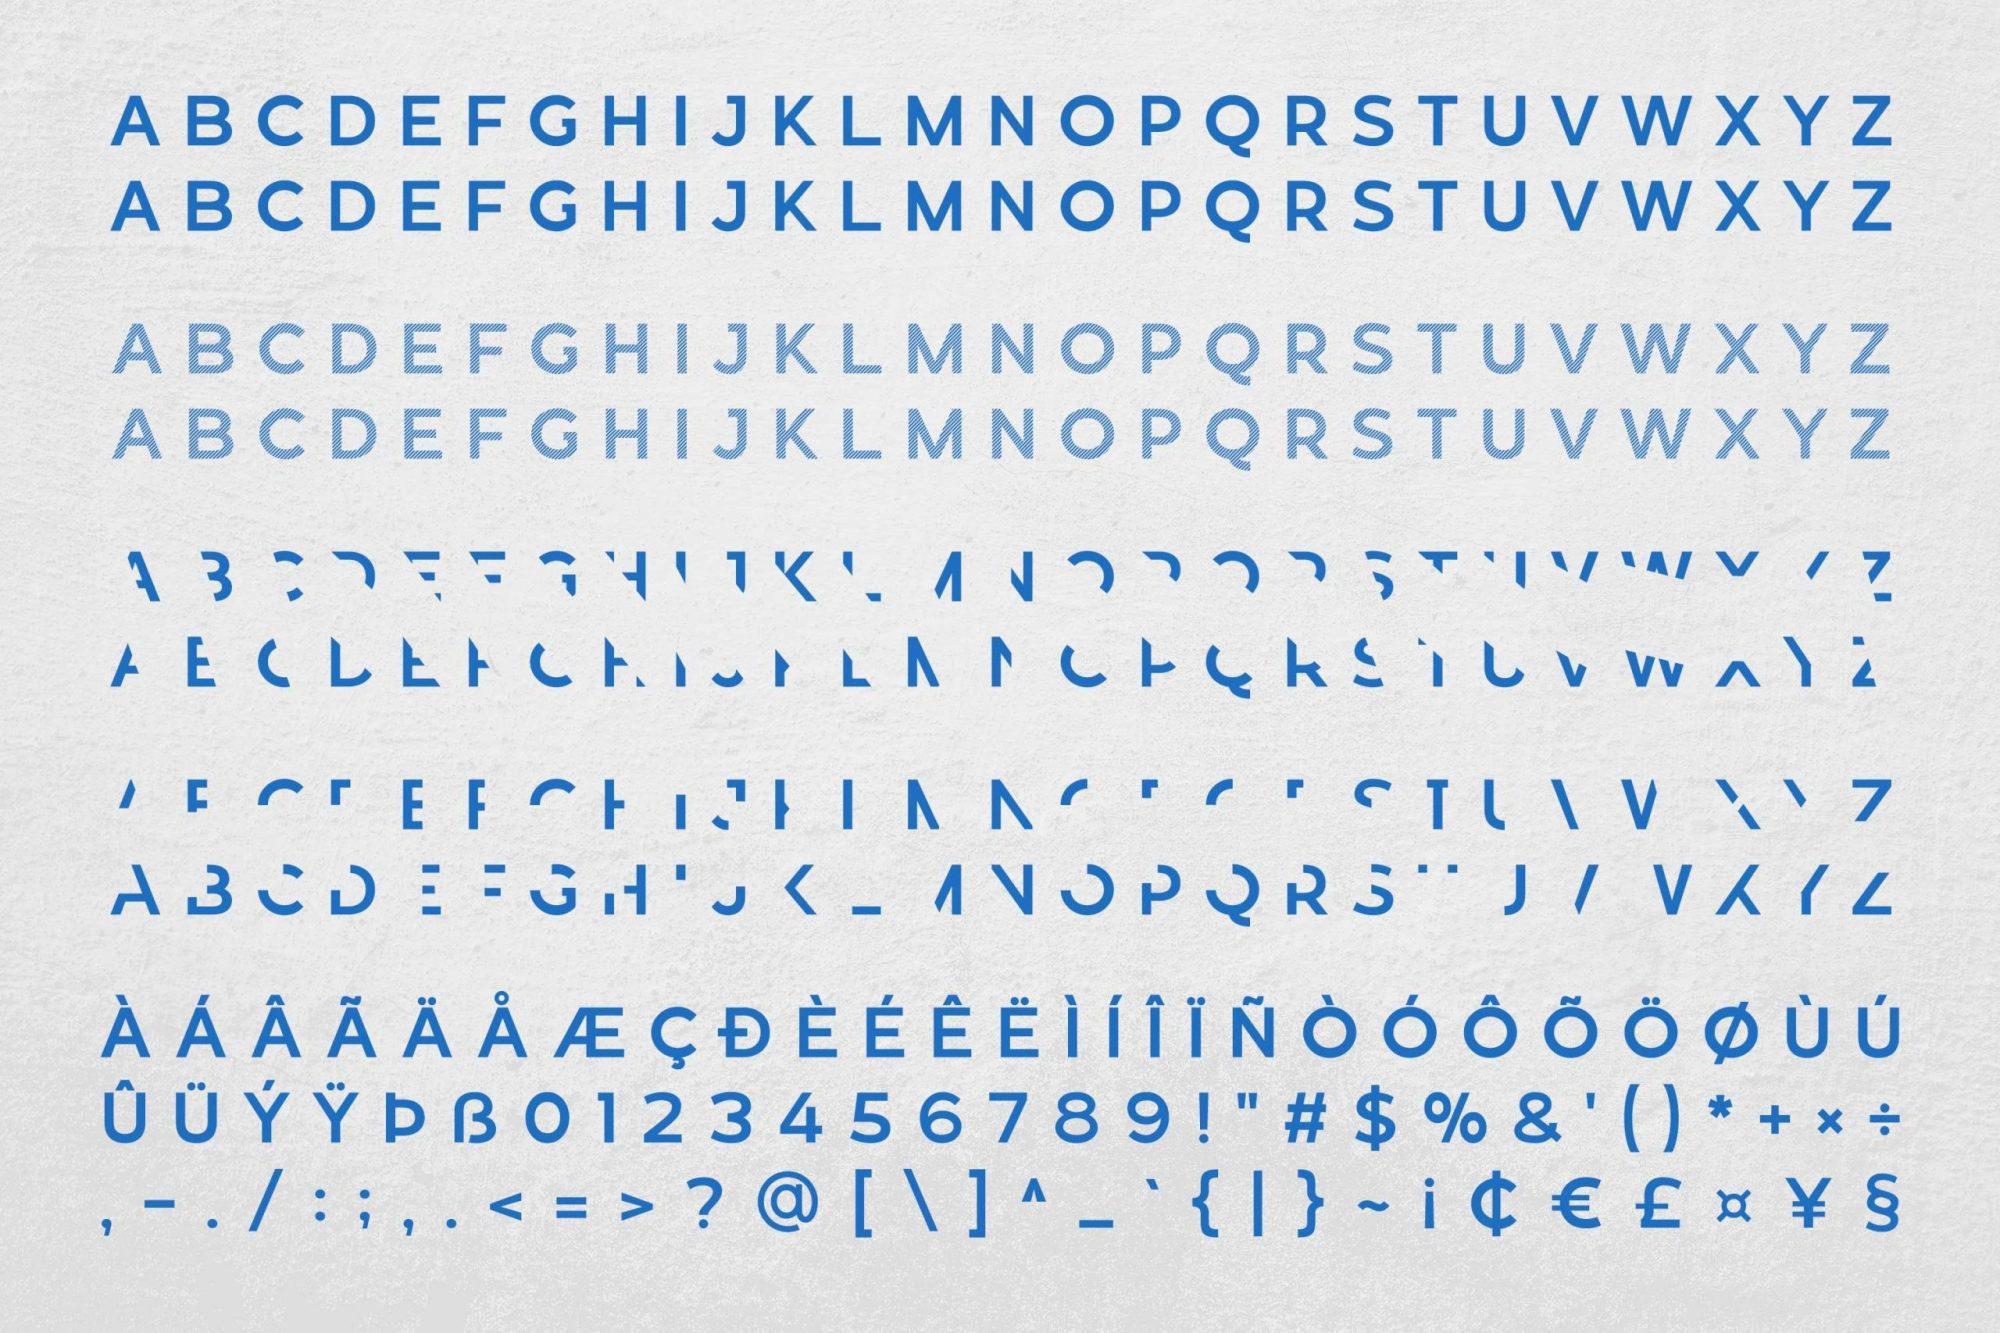 Revoxa-Modern-Display-Typeface-3